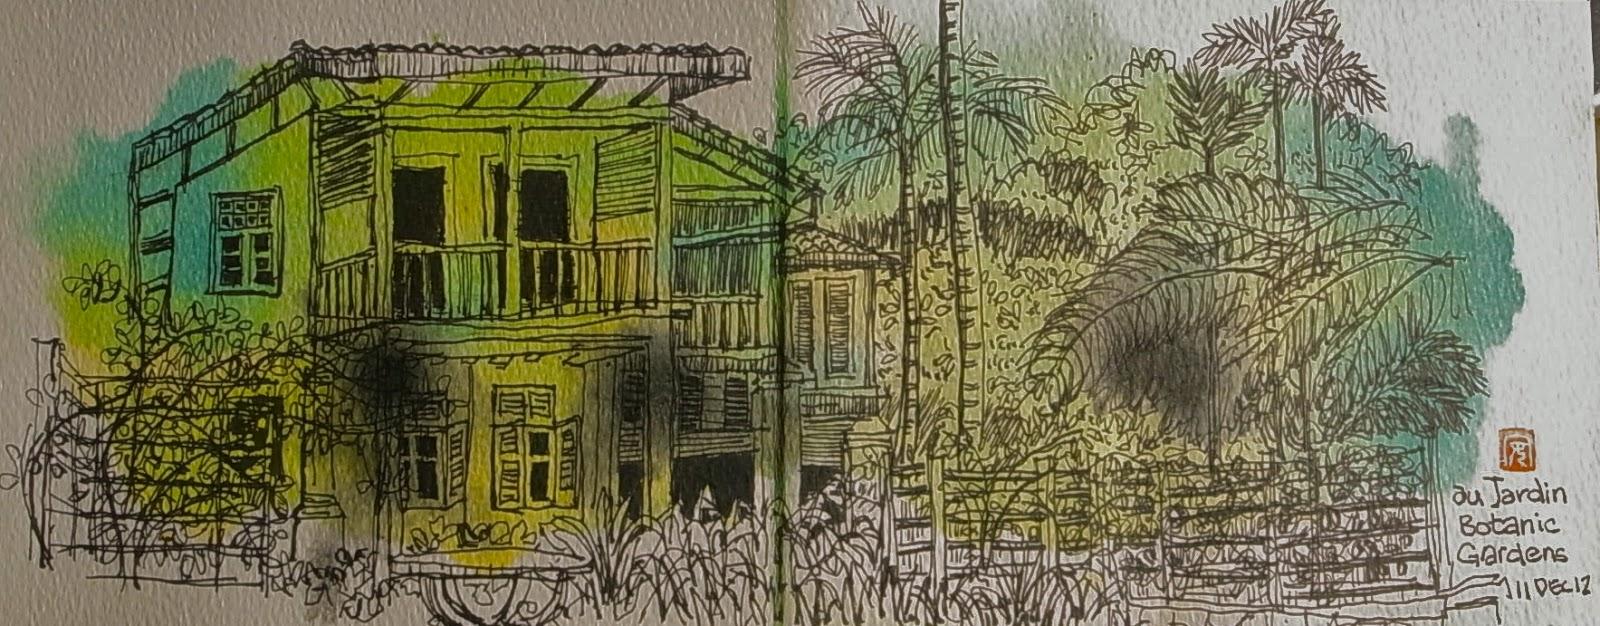 Francis theo botanic gardens sketches 11 dec 12 for Au jardin restaurant singapore